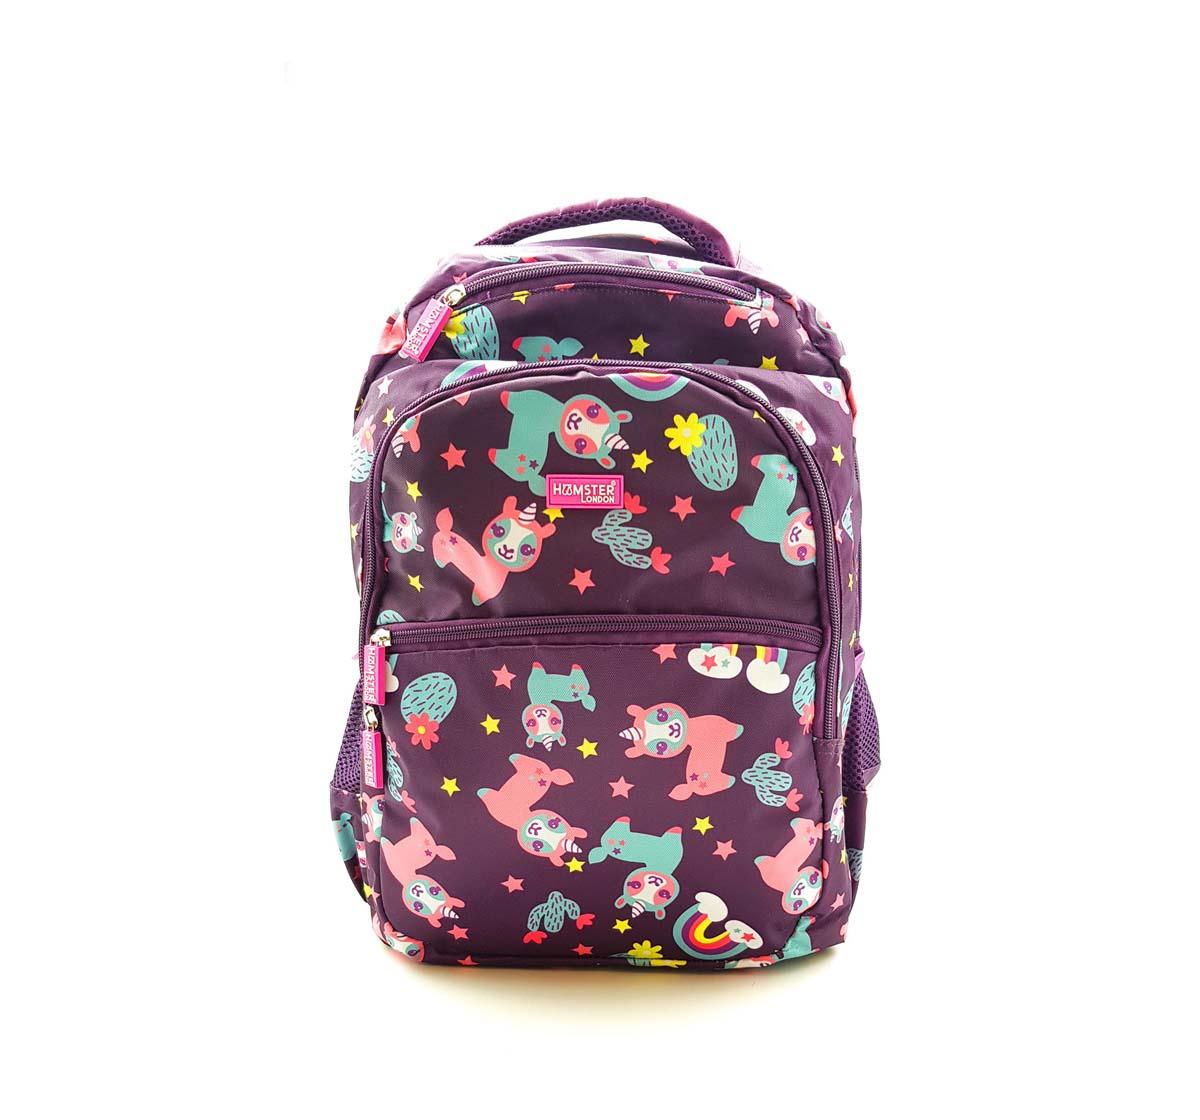 Hamster London | Hamster London Llama Backpack Travel for Kids Age 3Y+ (Purple)